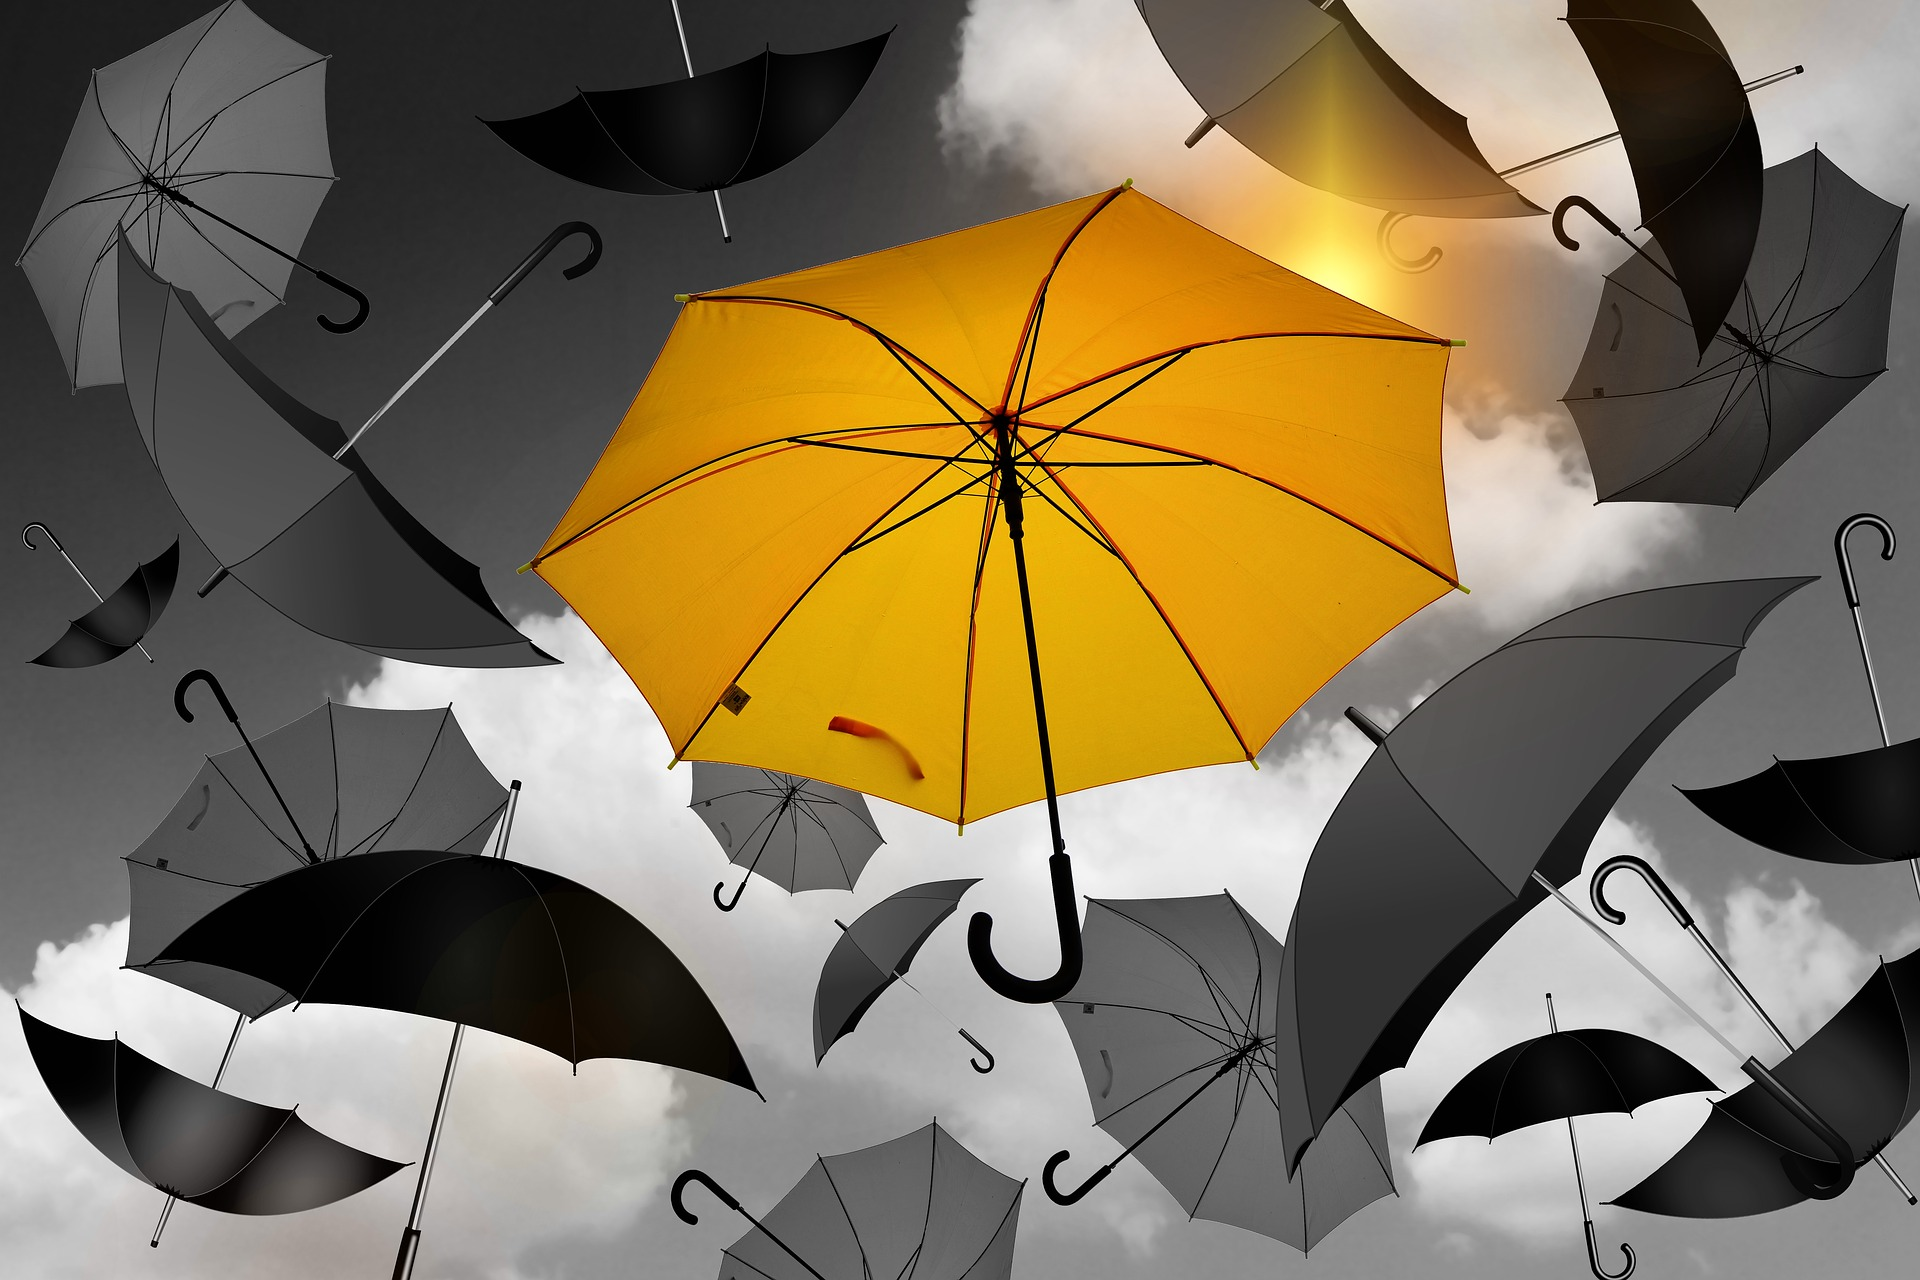 credinte toxice - sfatulparintilor.ro - pixabay_com - umbrella-1588167_1920